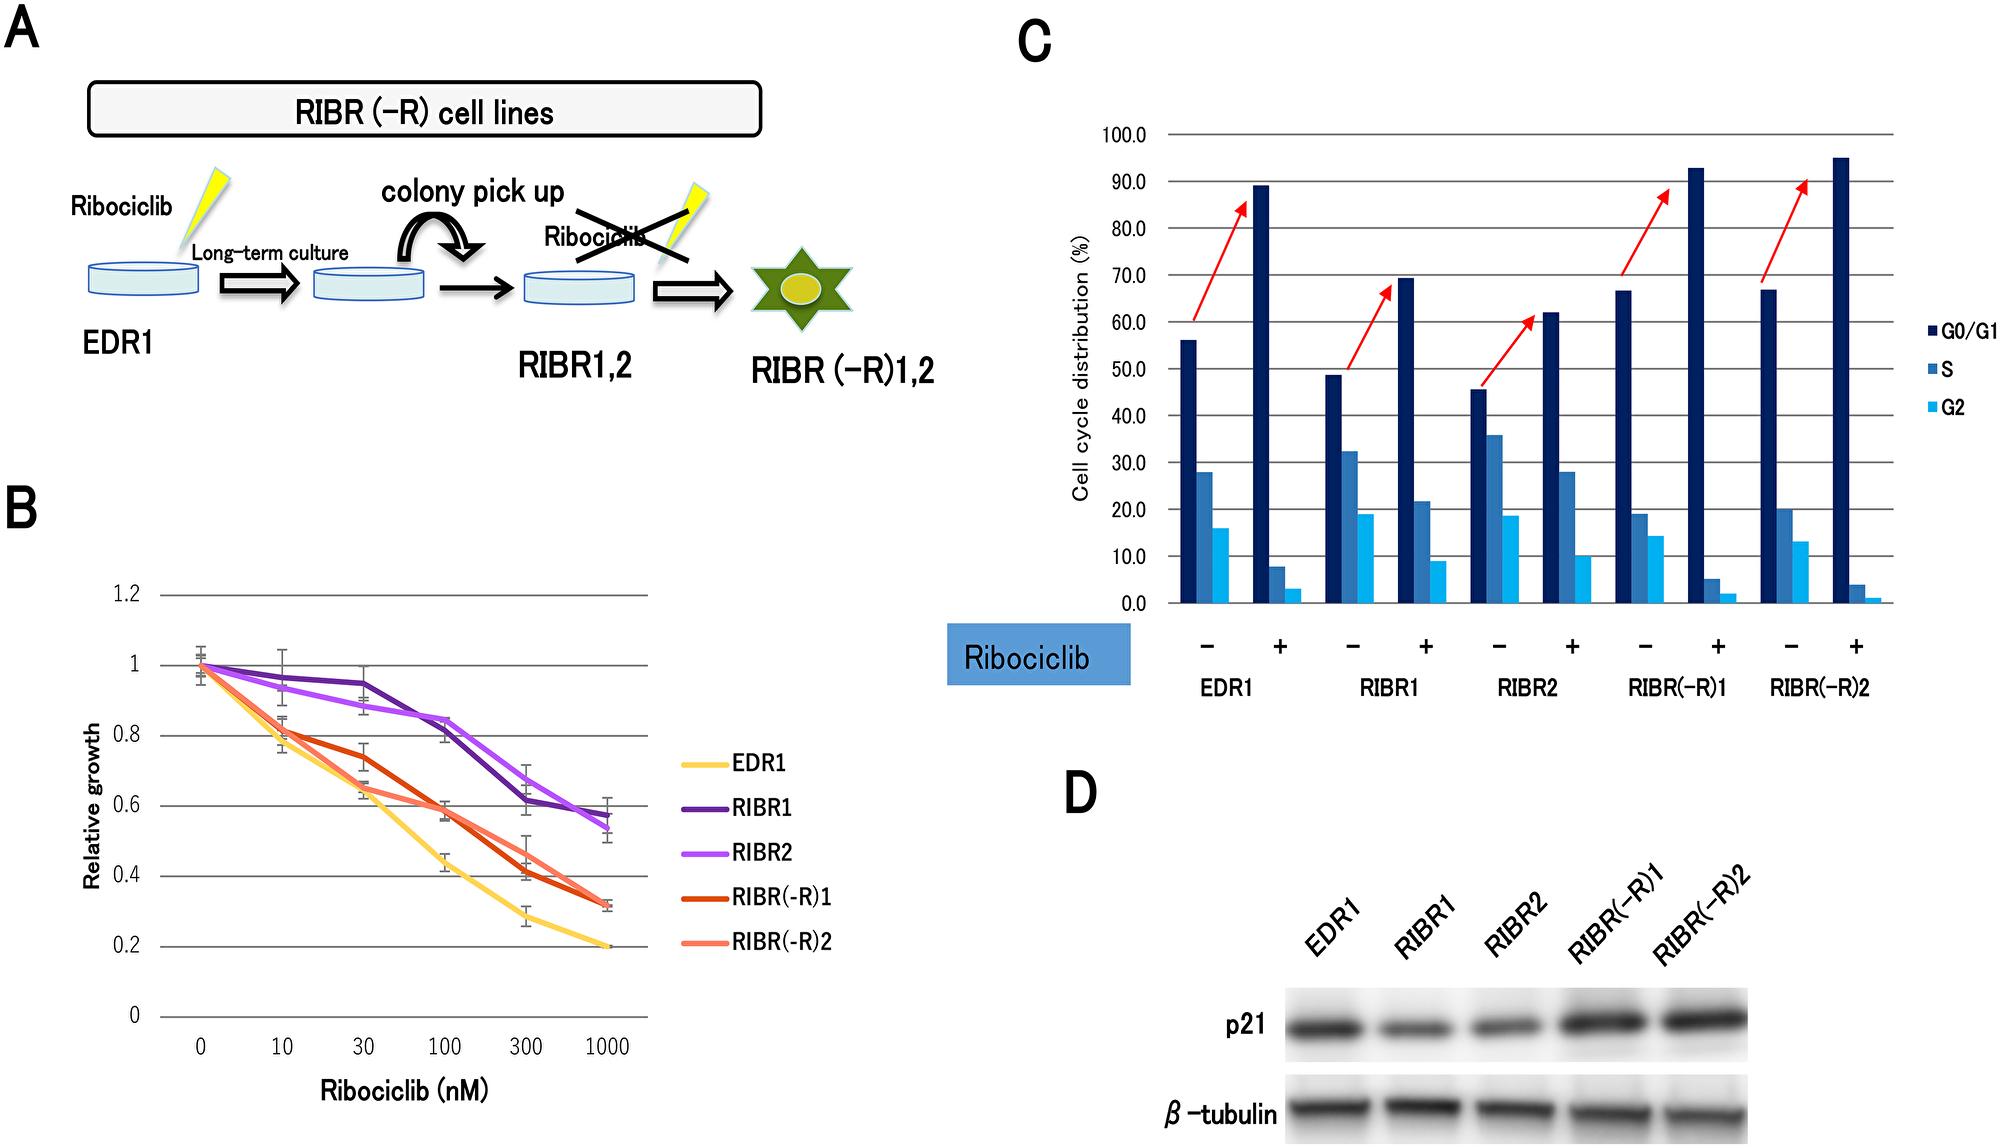 Establishment of ribociclib-resistant cell lines with long-term ribociclib depletion (RIBR(-R)).